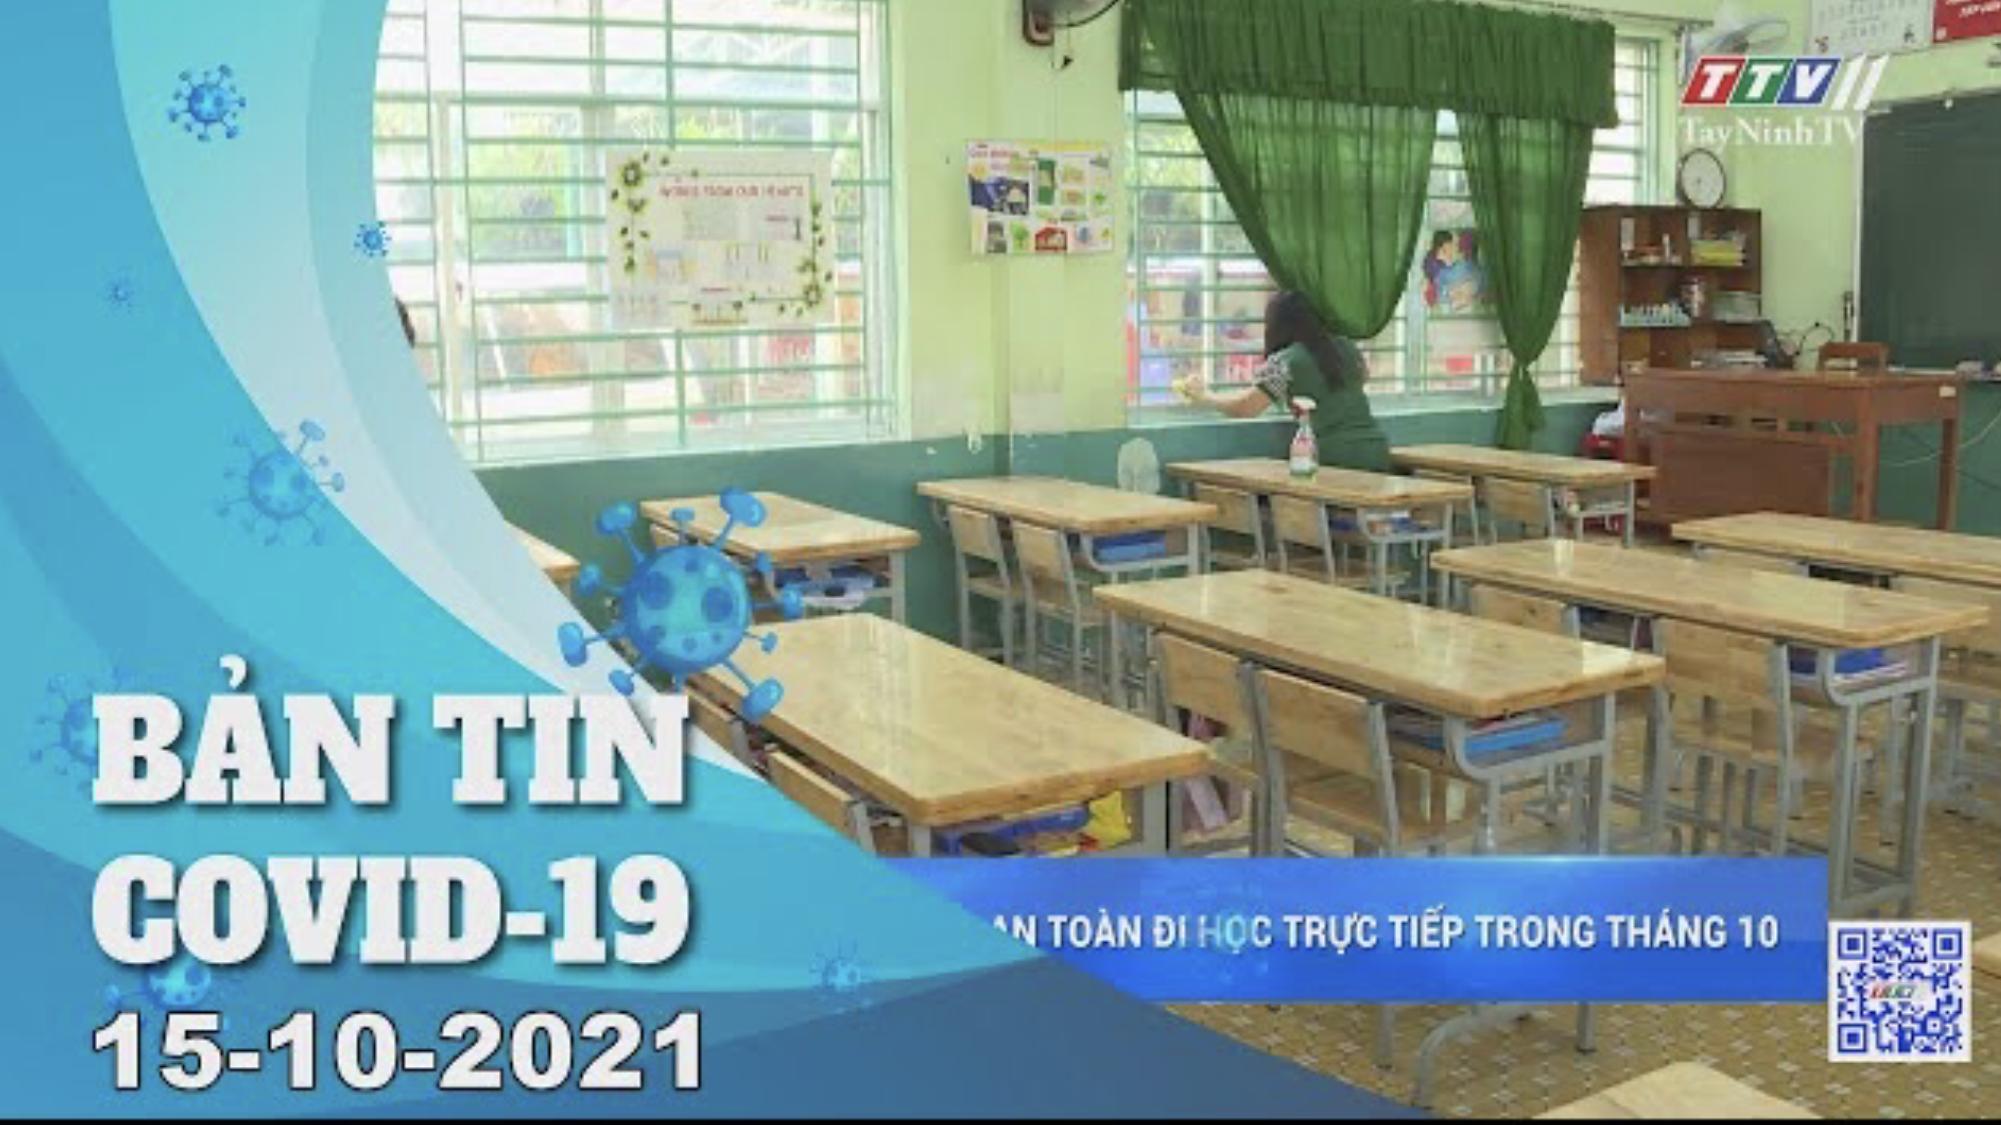 BẢN TIN COVID-19 15/10/2021 | Tin tức hôm nay | TayNinhTV